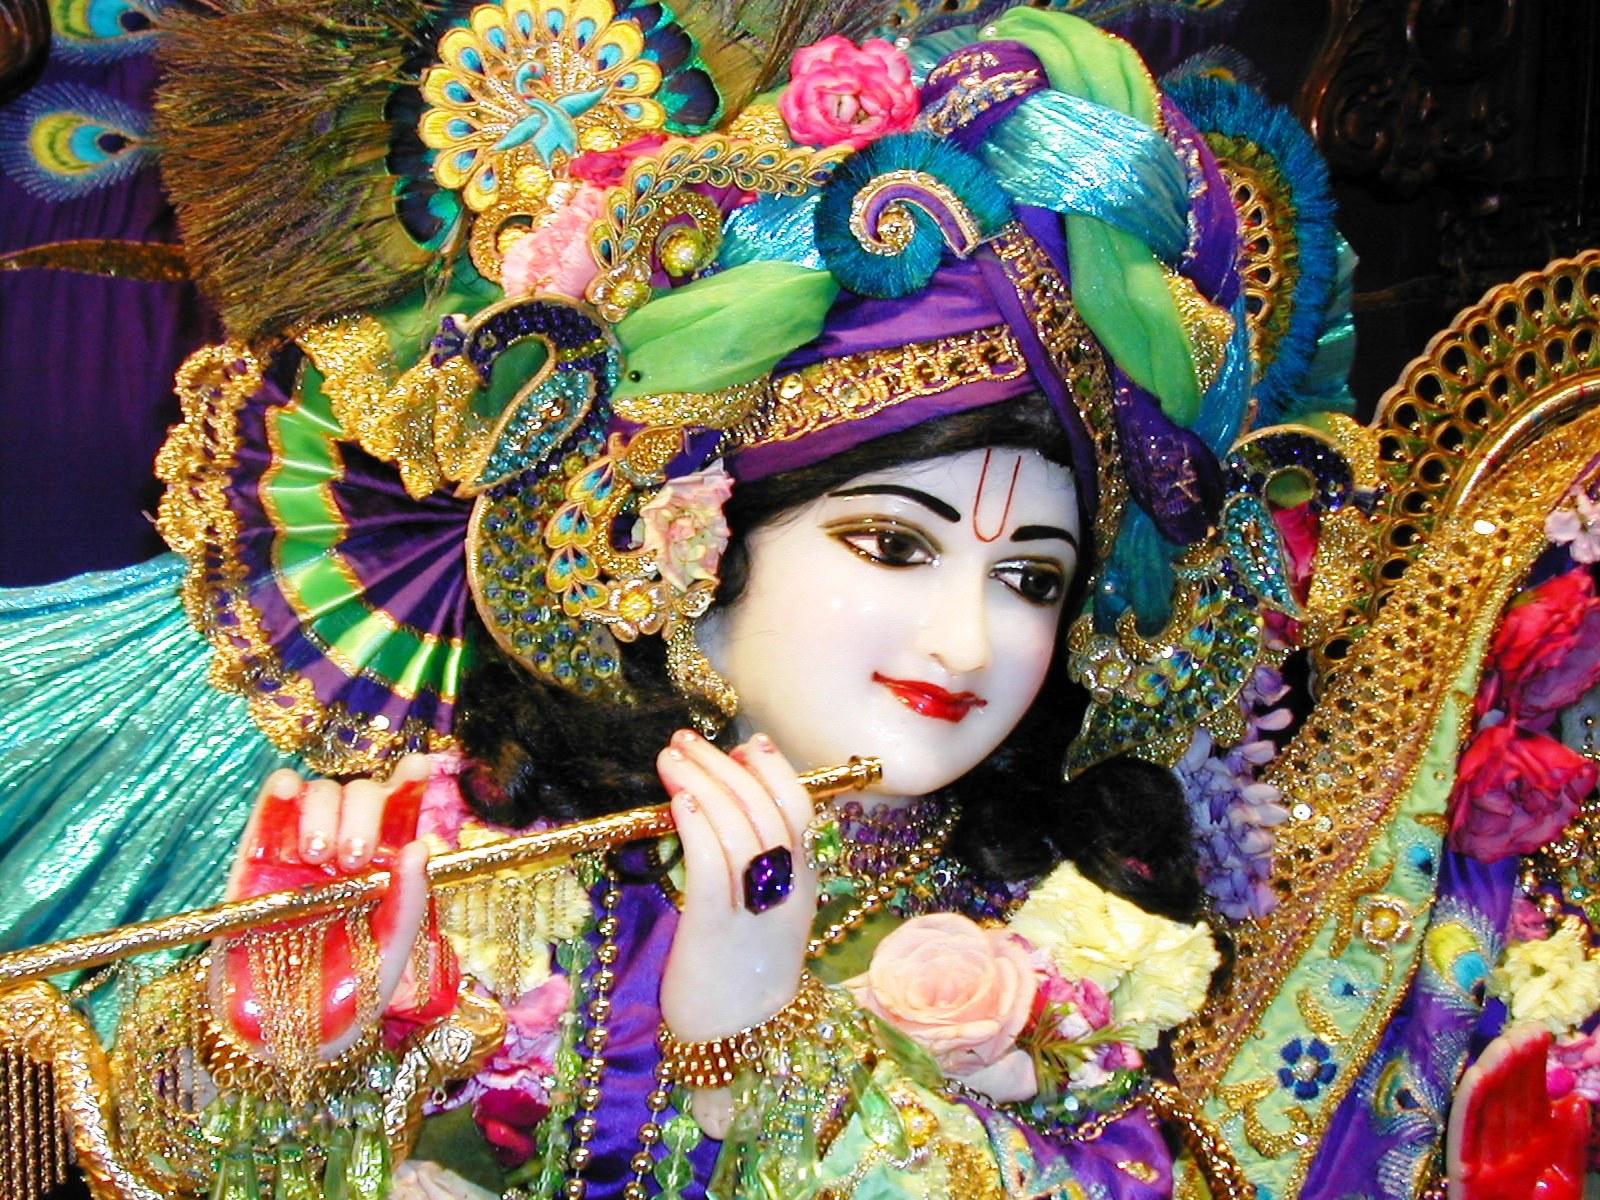 Wallpaper download krishna - Krishna Hd Wallpaper Full Screen Pics Of God Krishna Hd Images Of God